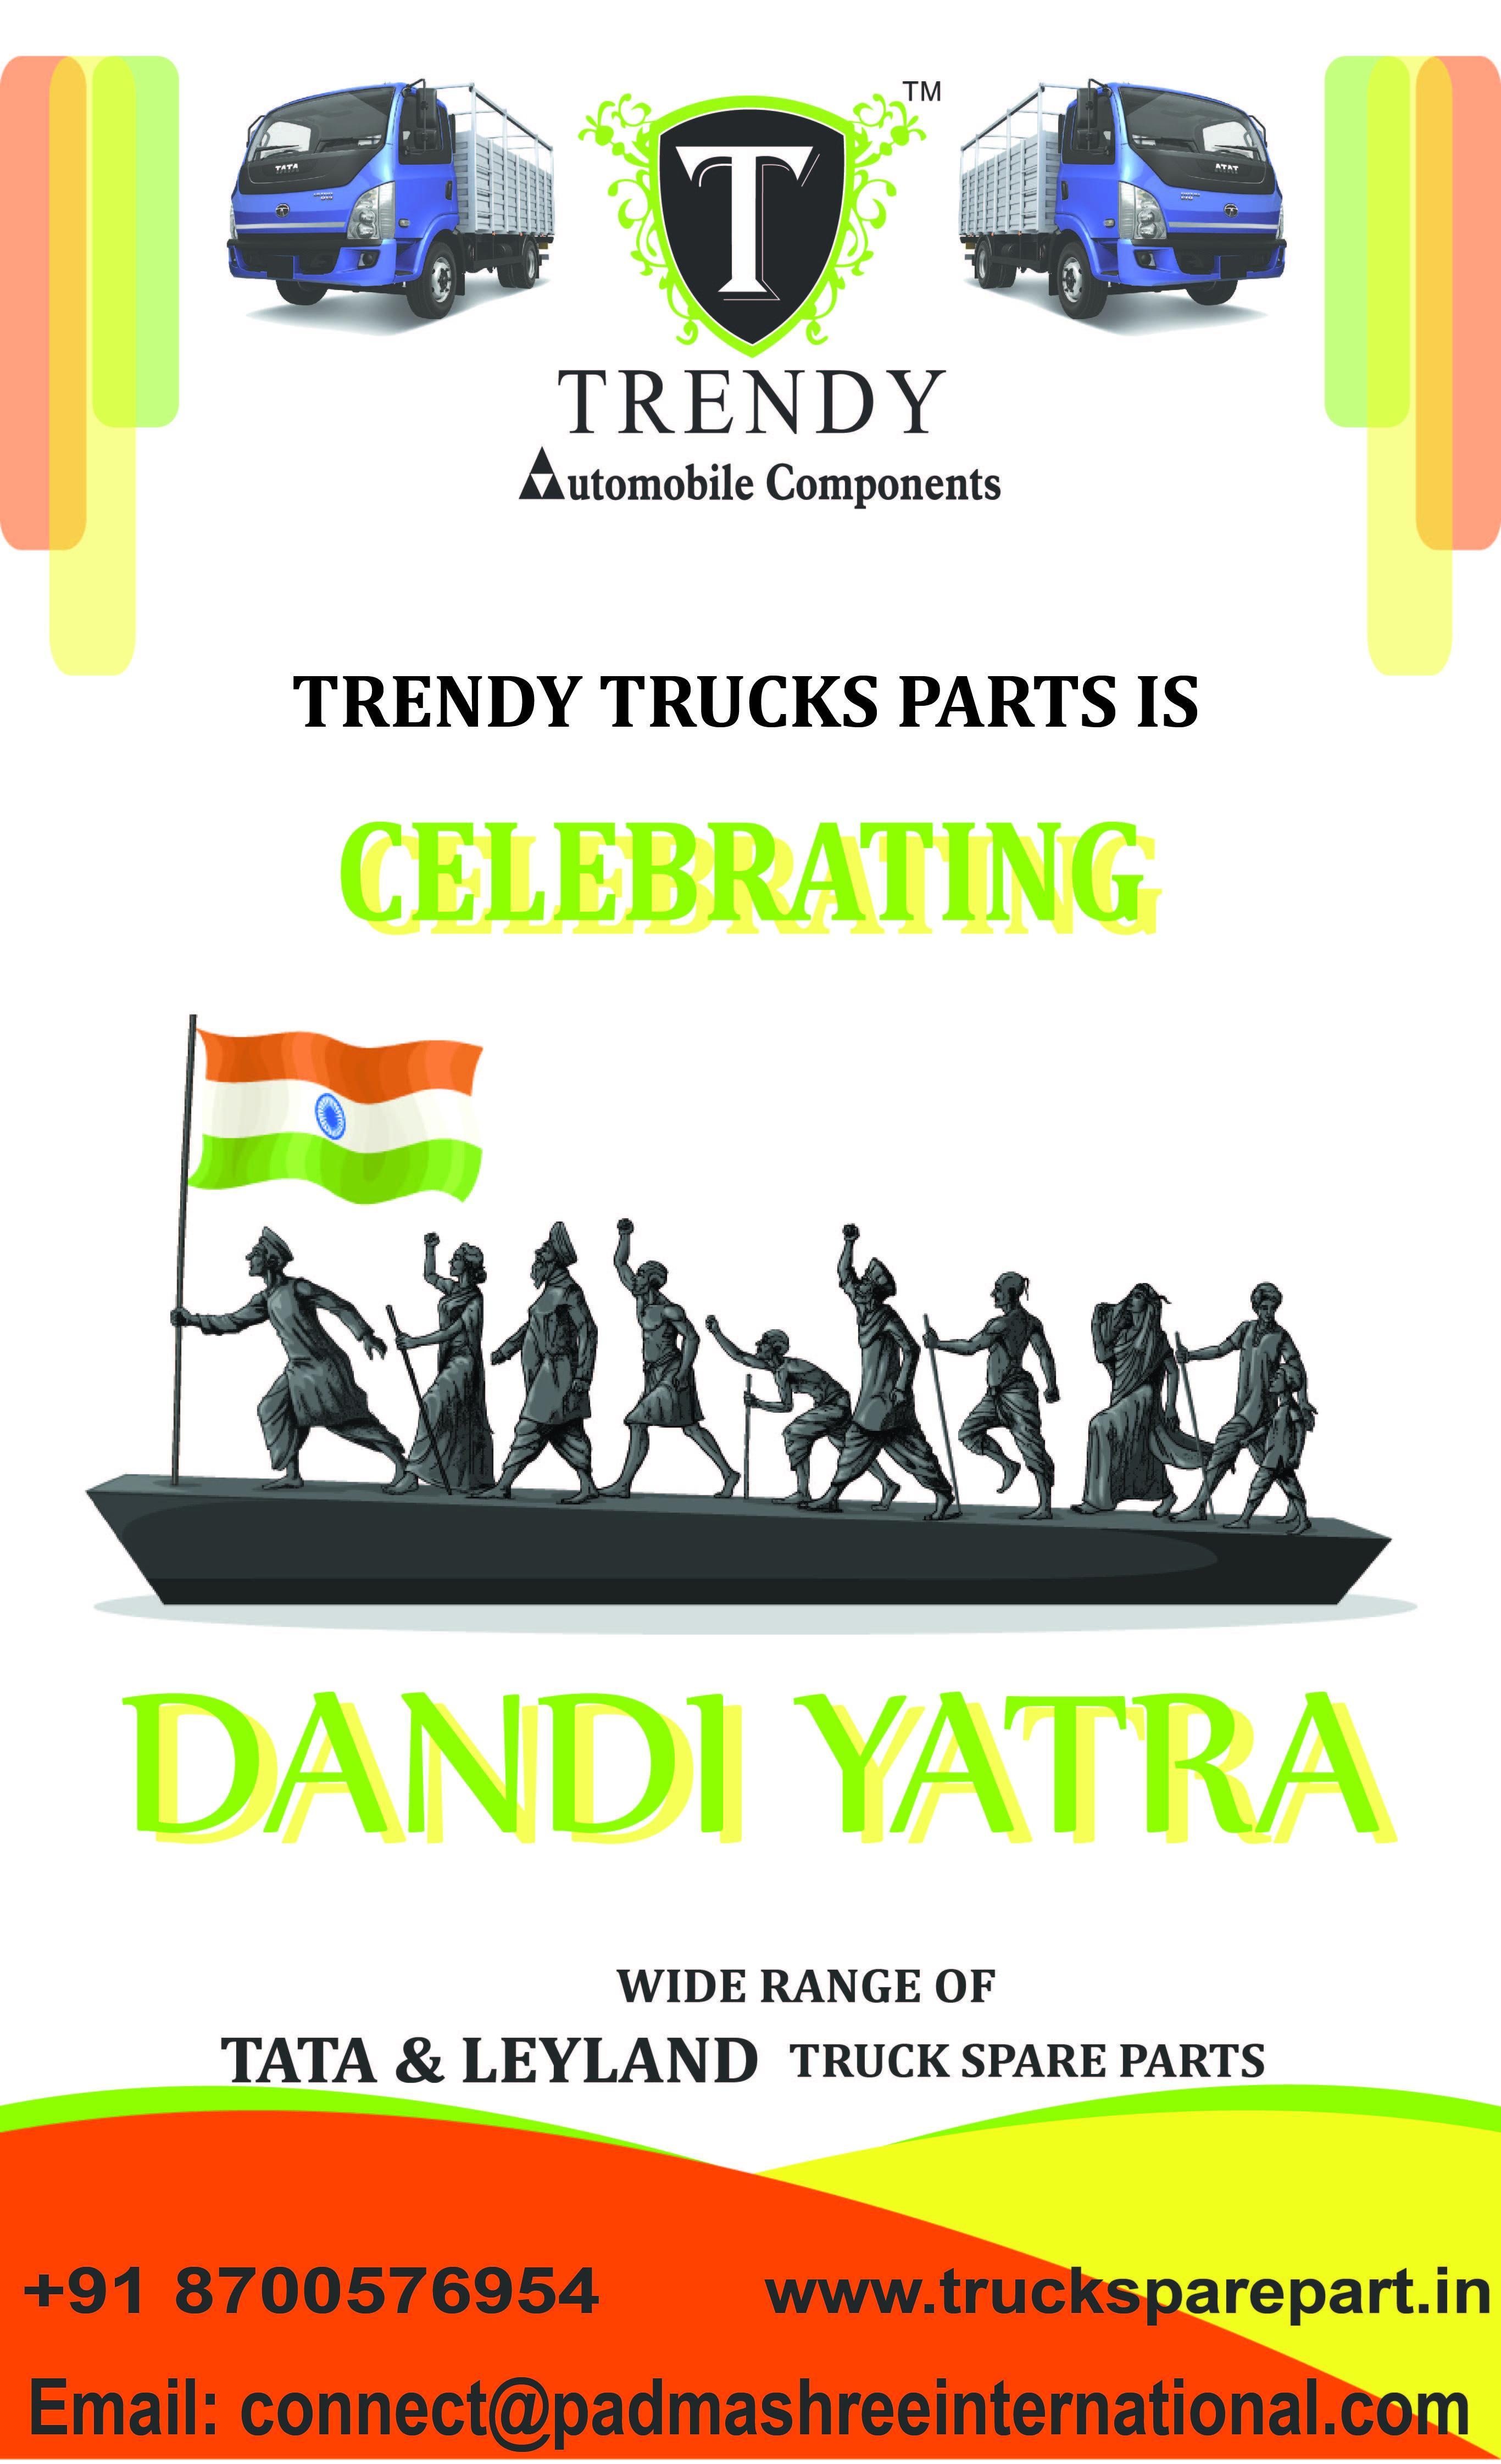 Tata Leyland Truck Parts